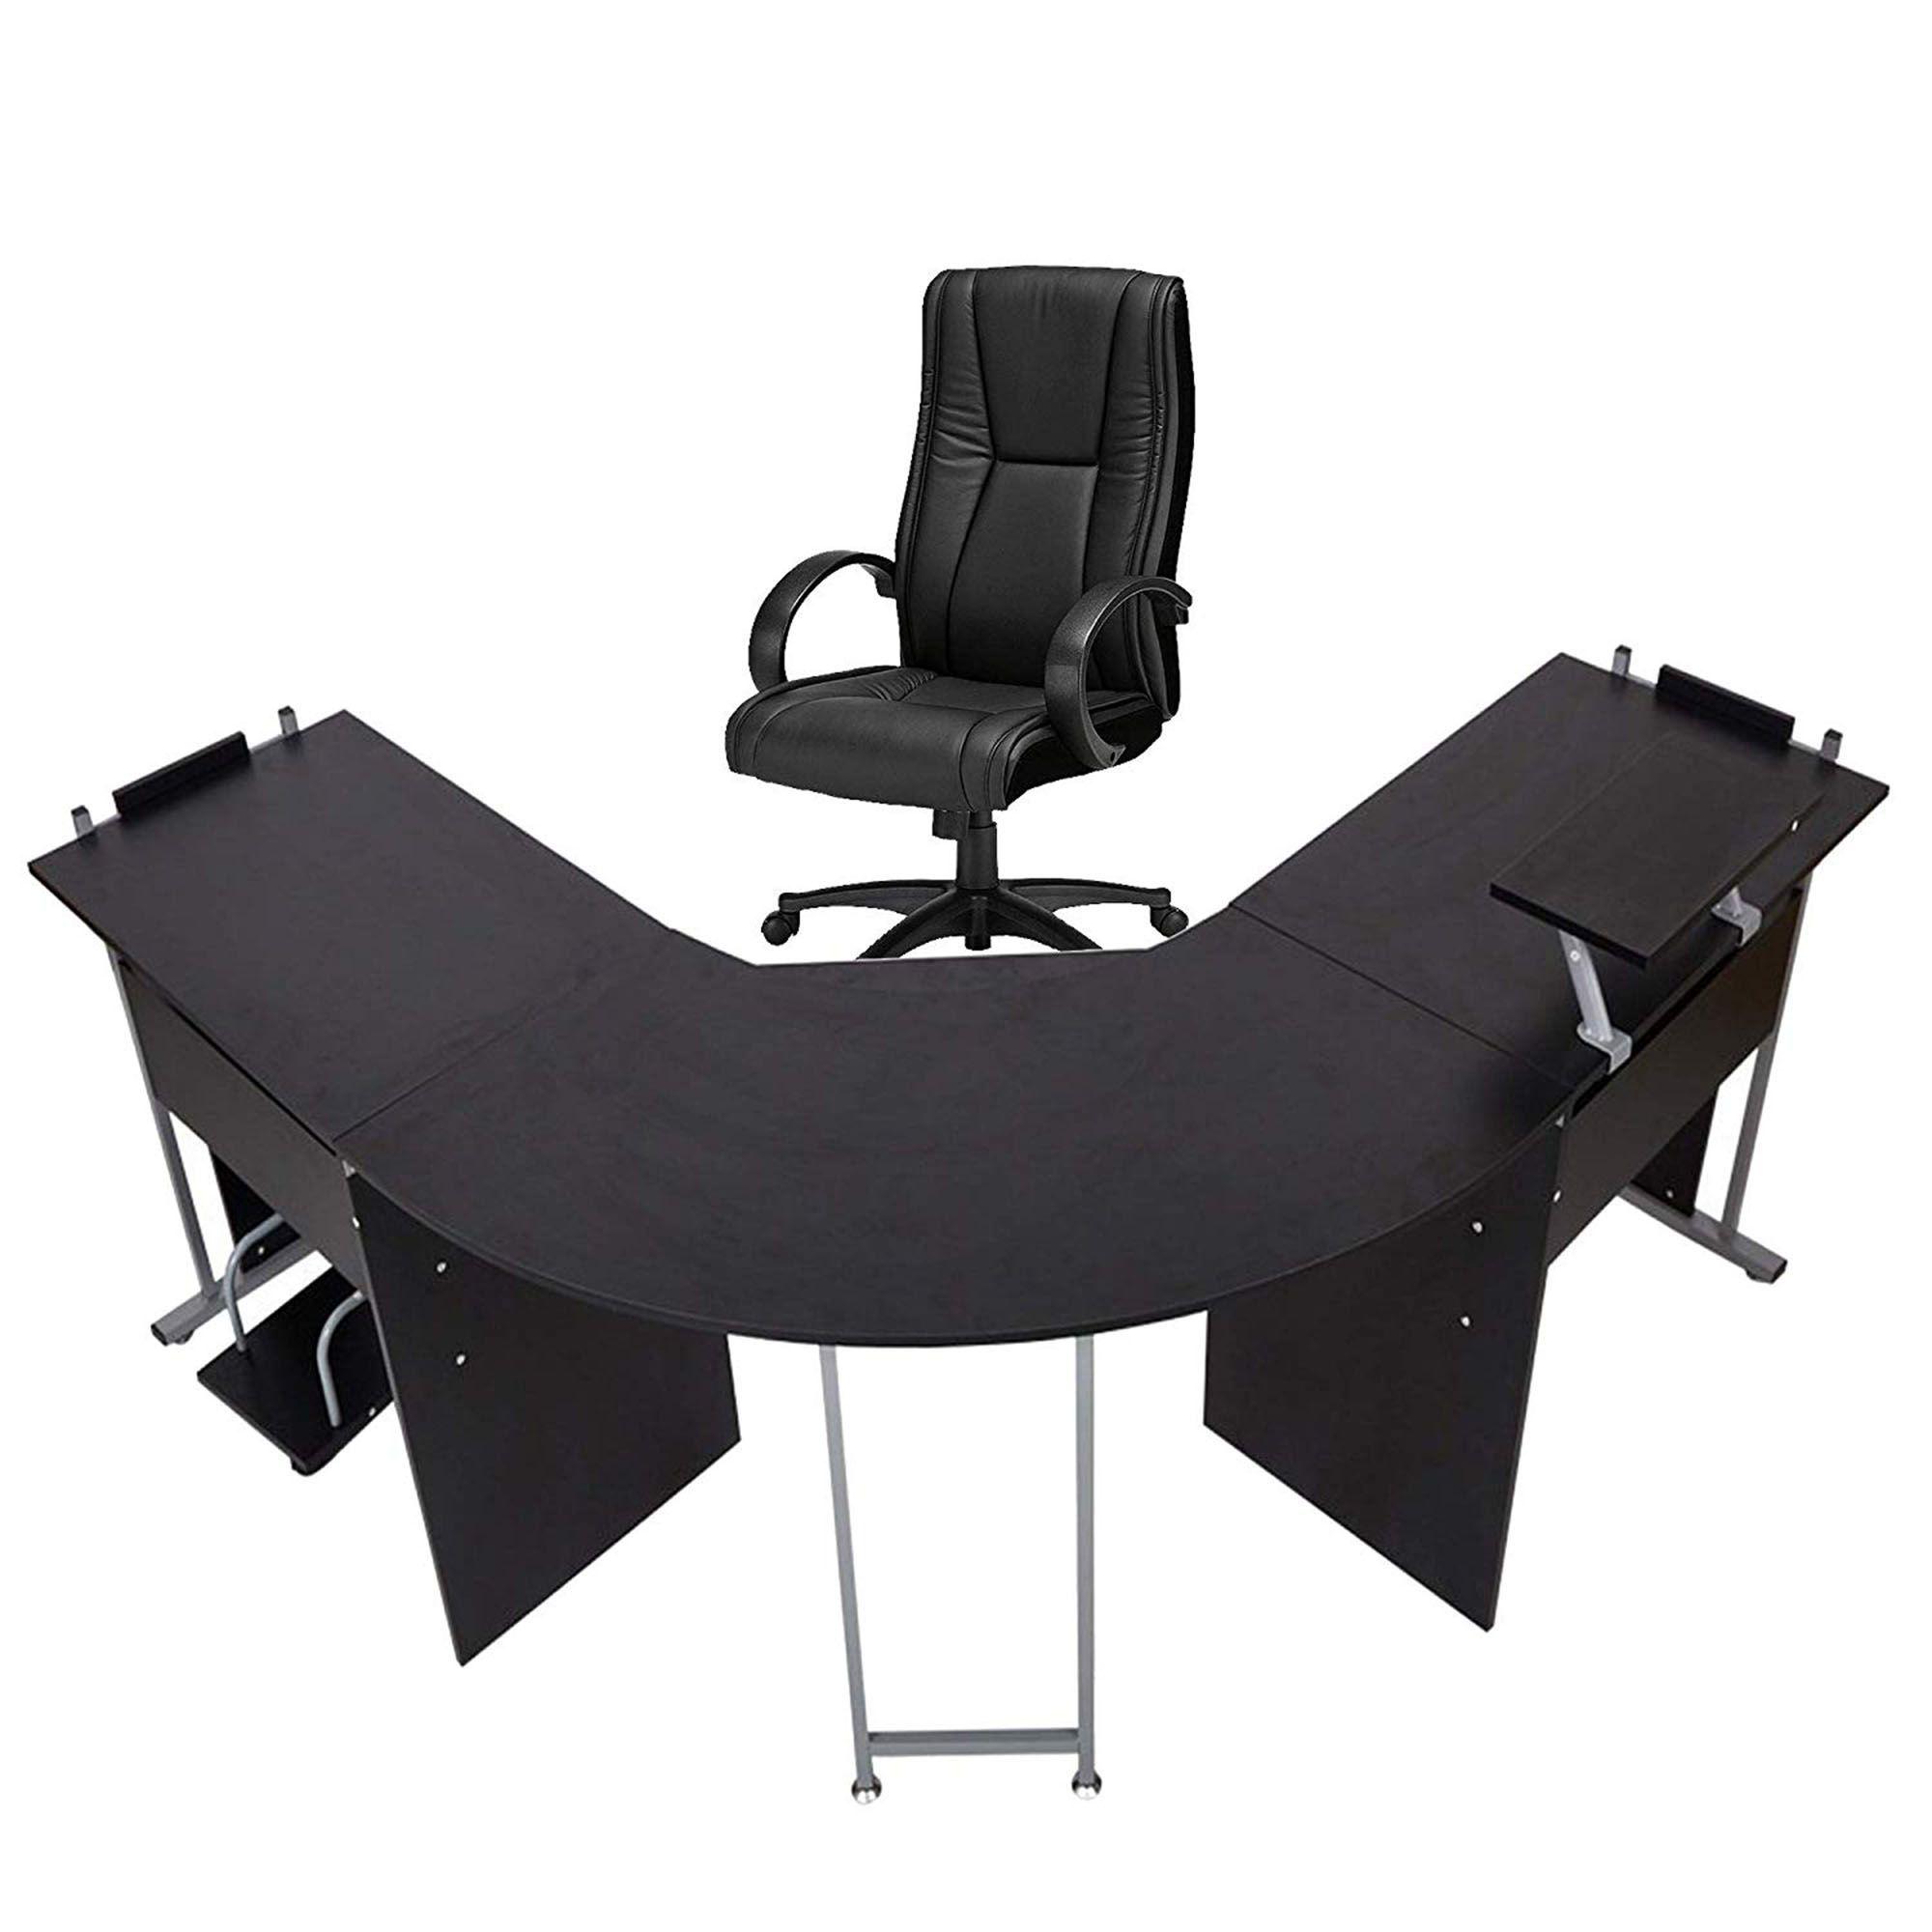 Karmas Product 71 L Shaped Gaming Desk Black Walmart Com Gamingdesk Free 2 Day Shipping Buy Karmas Product 71 L Shaped Gaming Desk Black At Walmart Com